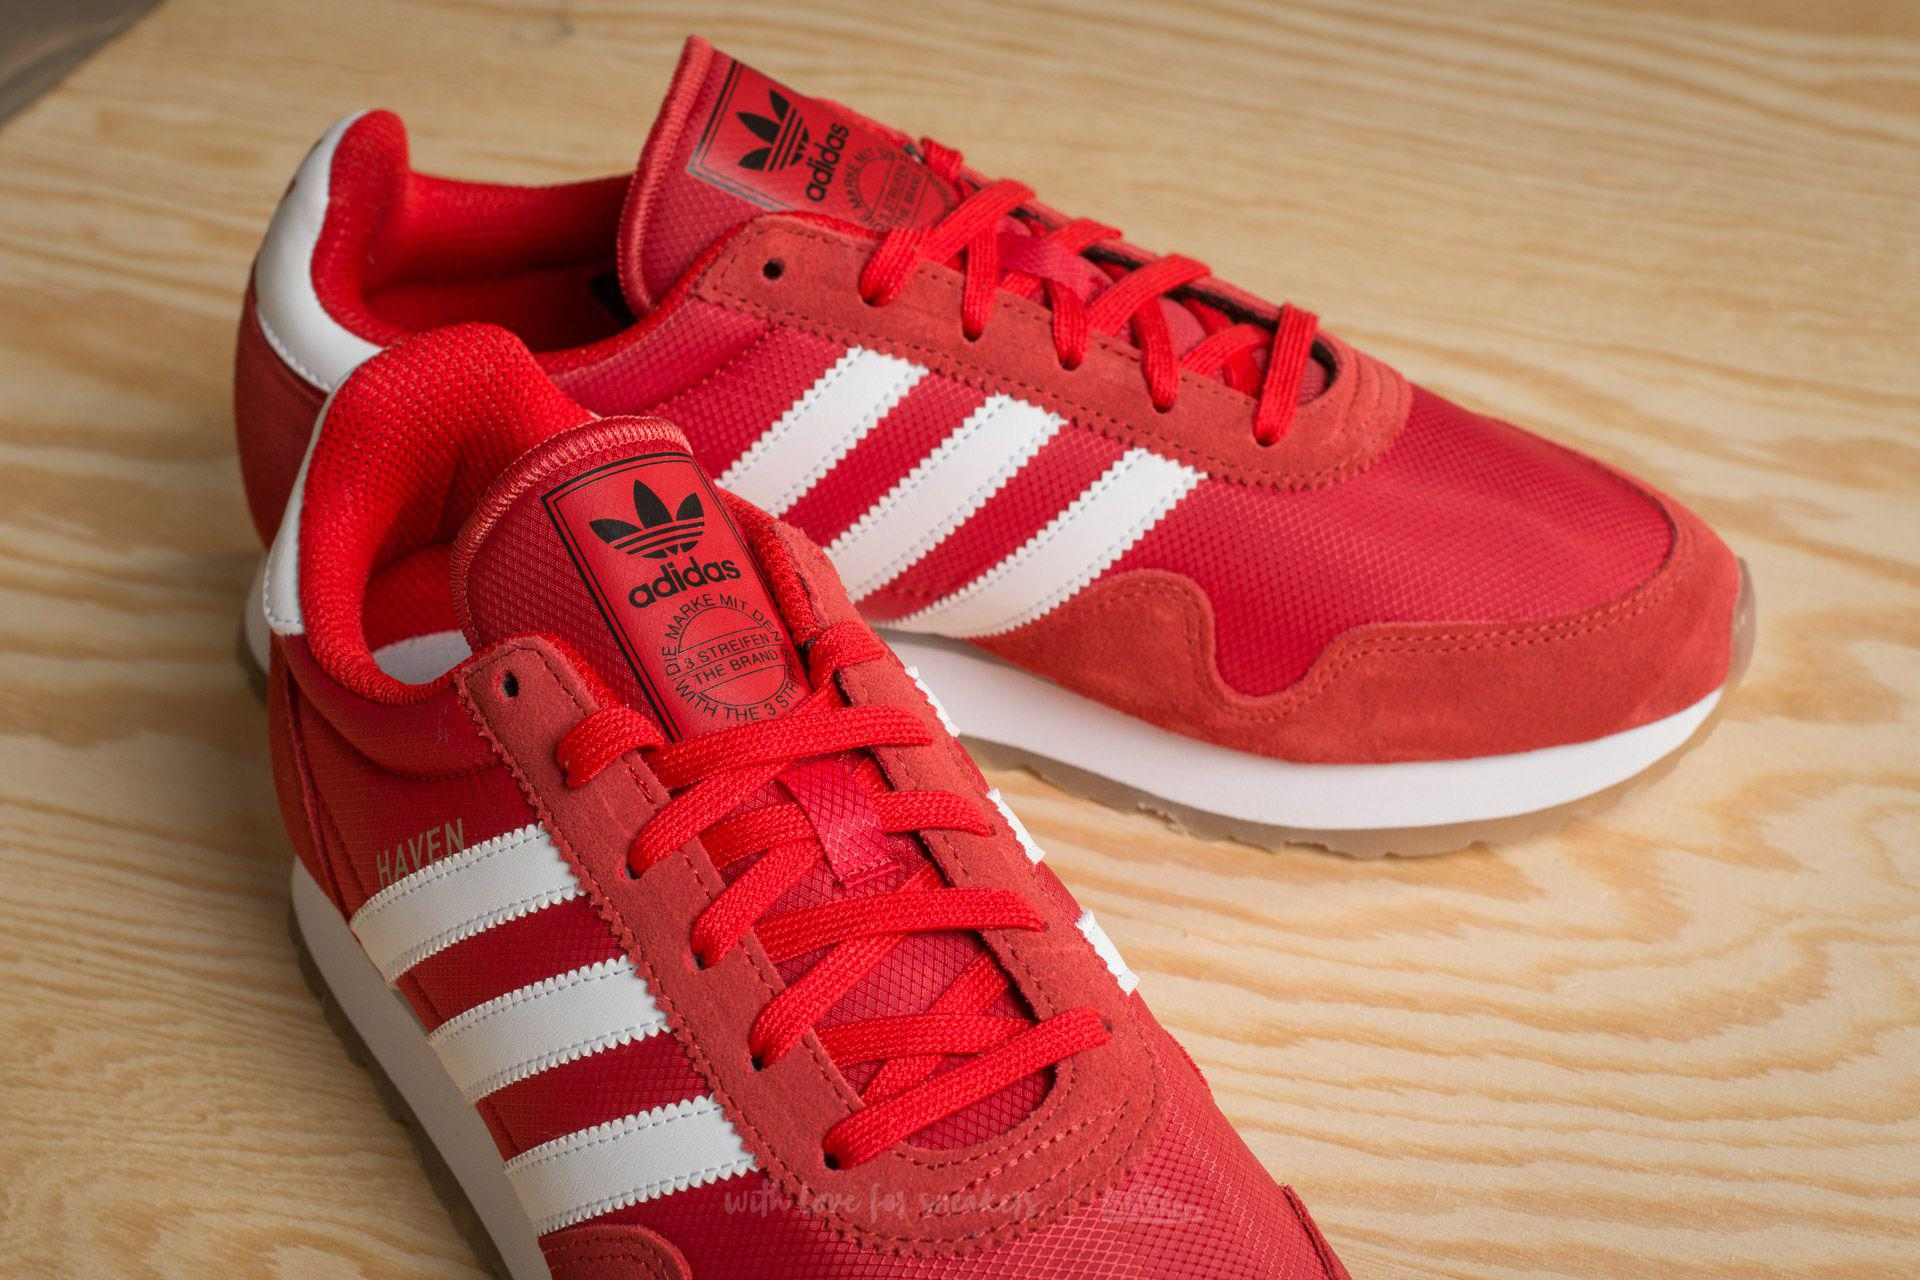 Lyst - adidas Originals Adidas Haven Red  Ftw White  Gum in Red for Men 04dd06f3c